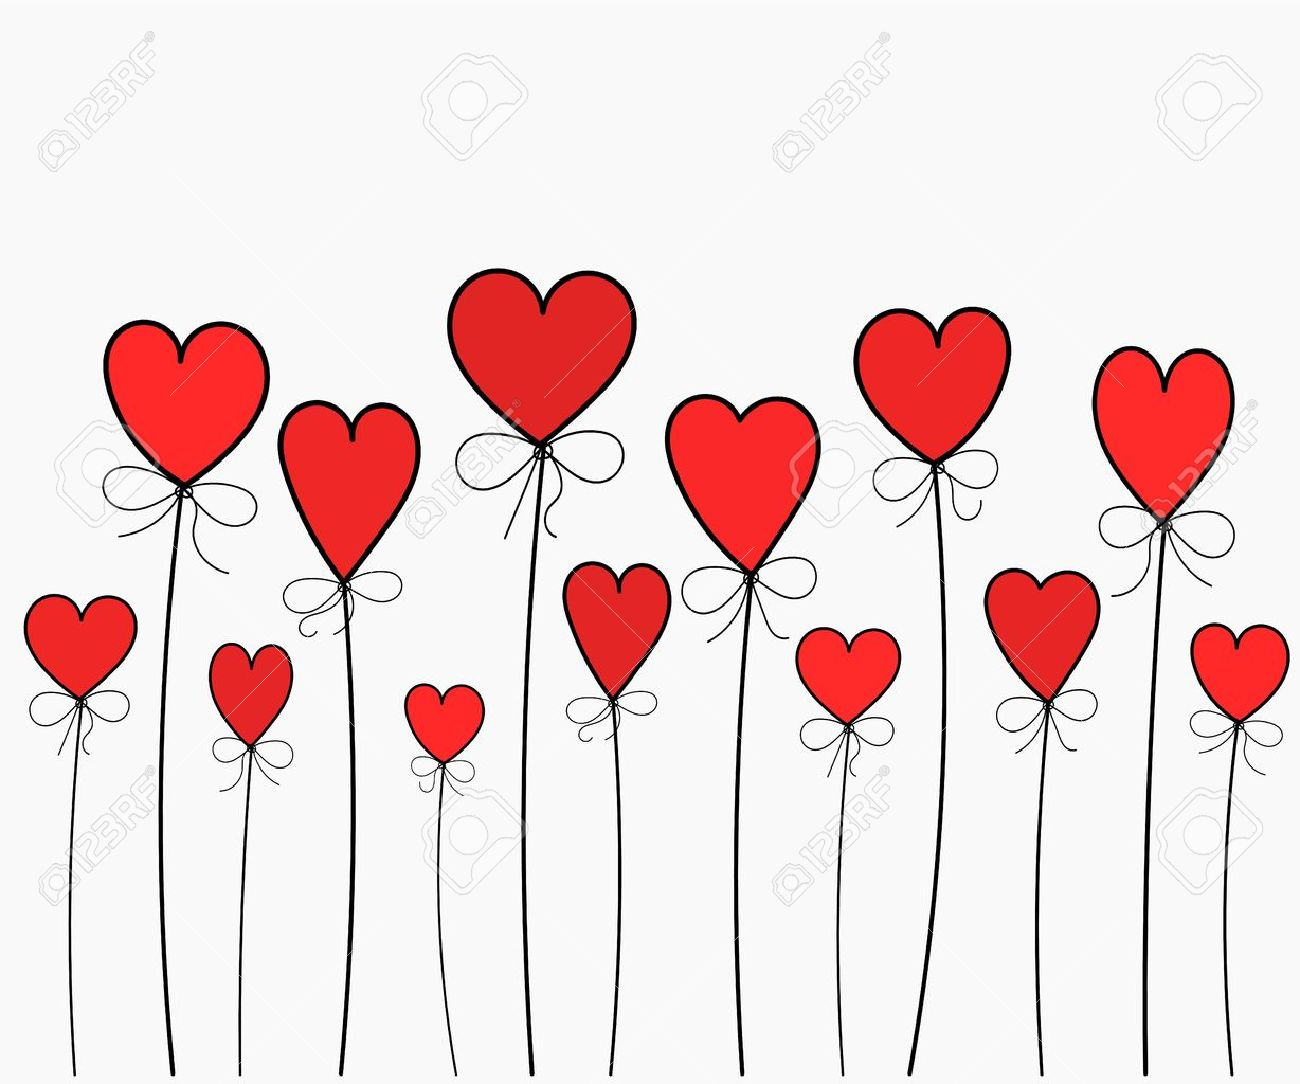 Hearts balloons - illustration background Stock Vector - 17519722